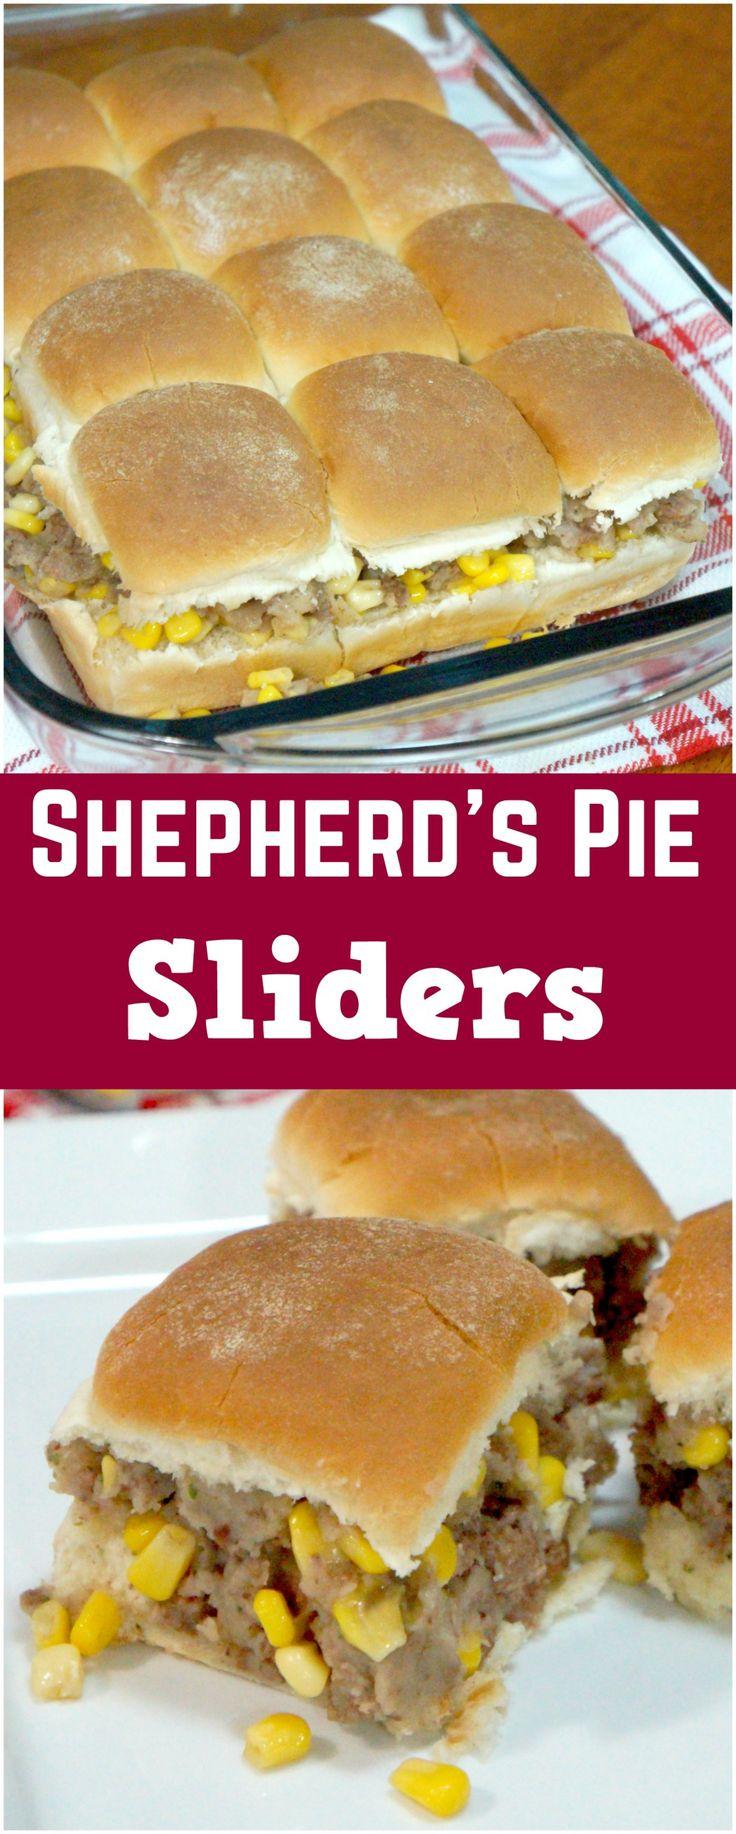 Shepherd's Pie Slider Sandwiches. Easy dinner recipe. Mini shepherd's pie sandwiches. Ground beef and mashed potatoes on a bun.